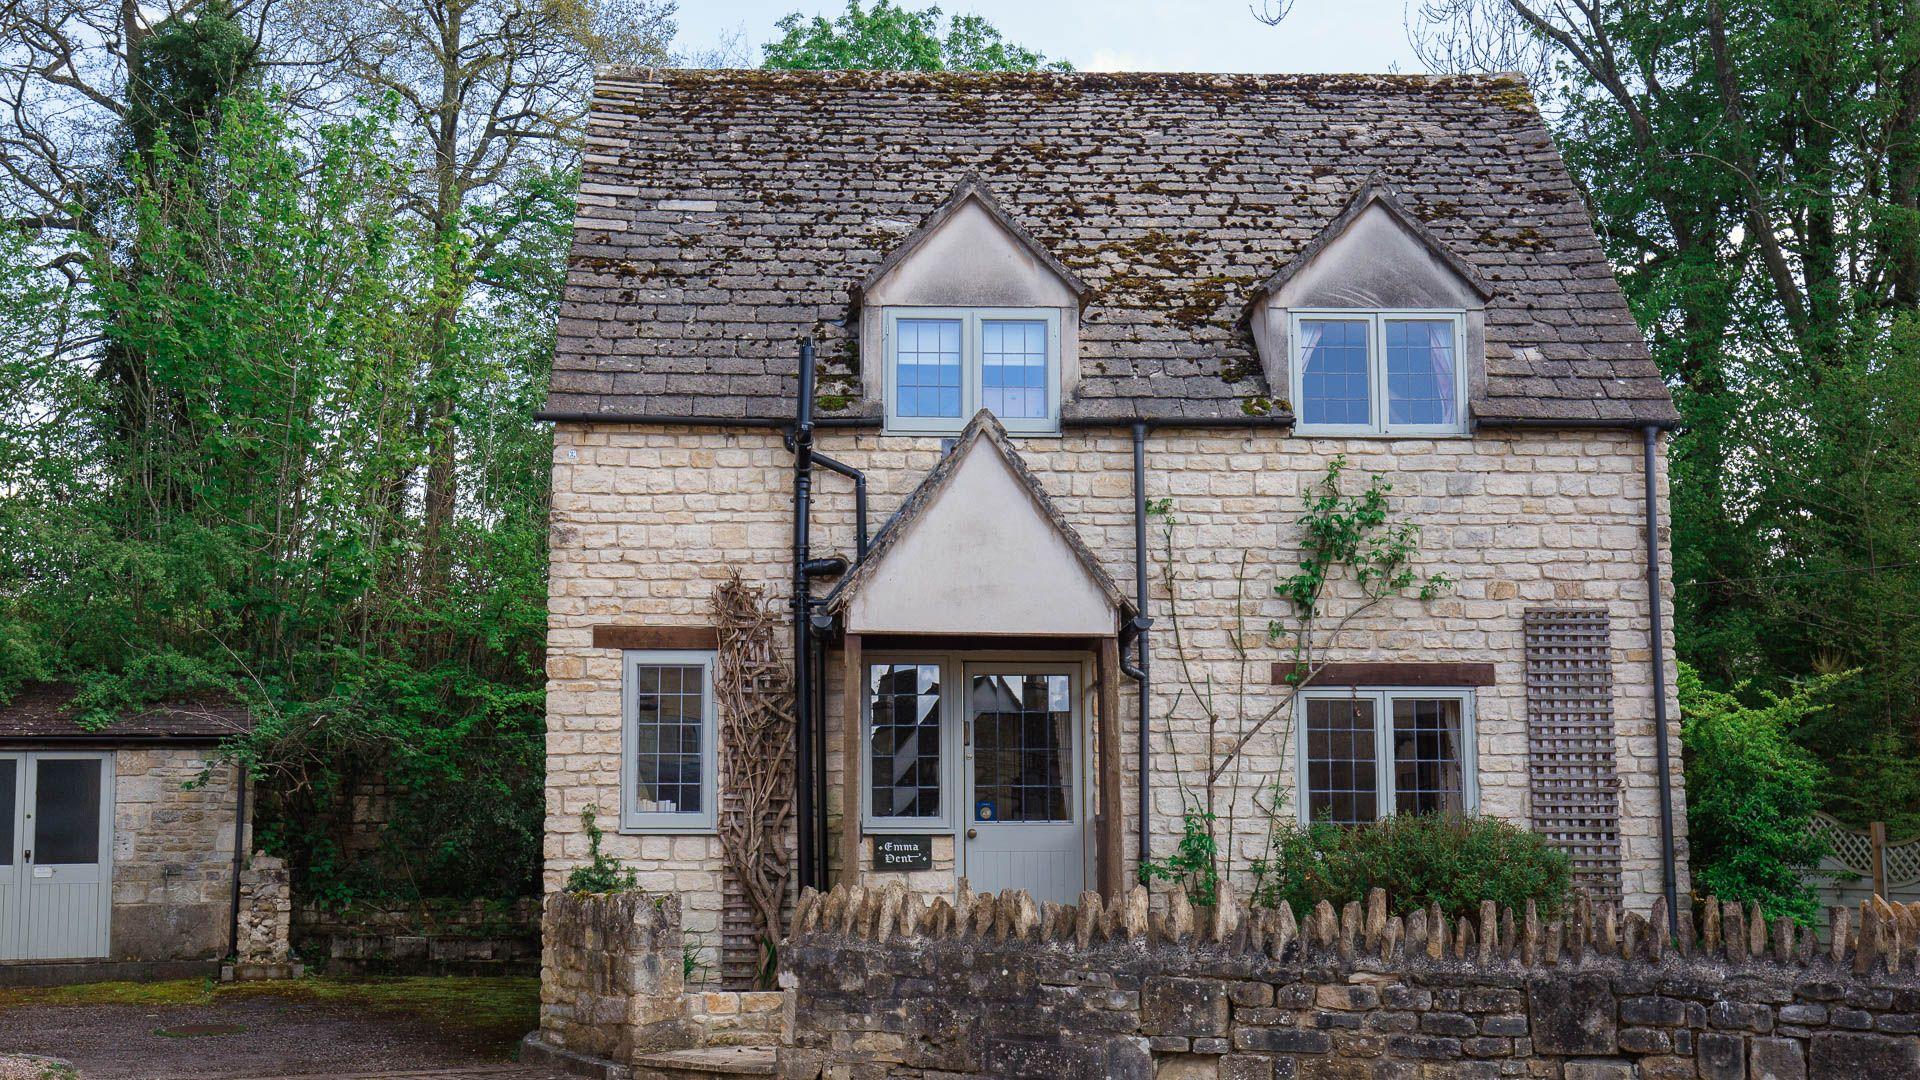 Emma Dent Cottage at Sudeley Castle, Bolthole Retreats